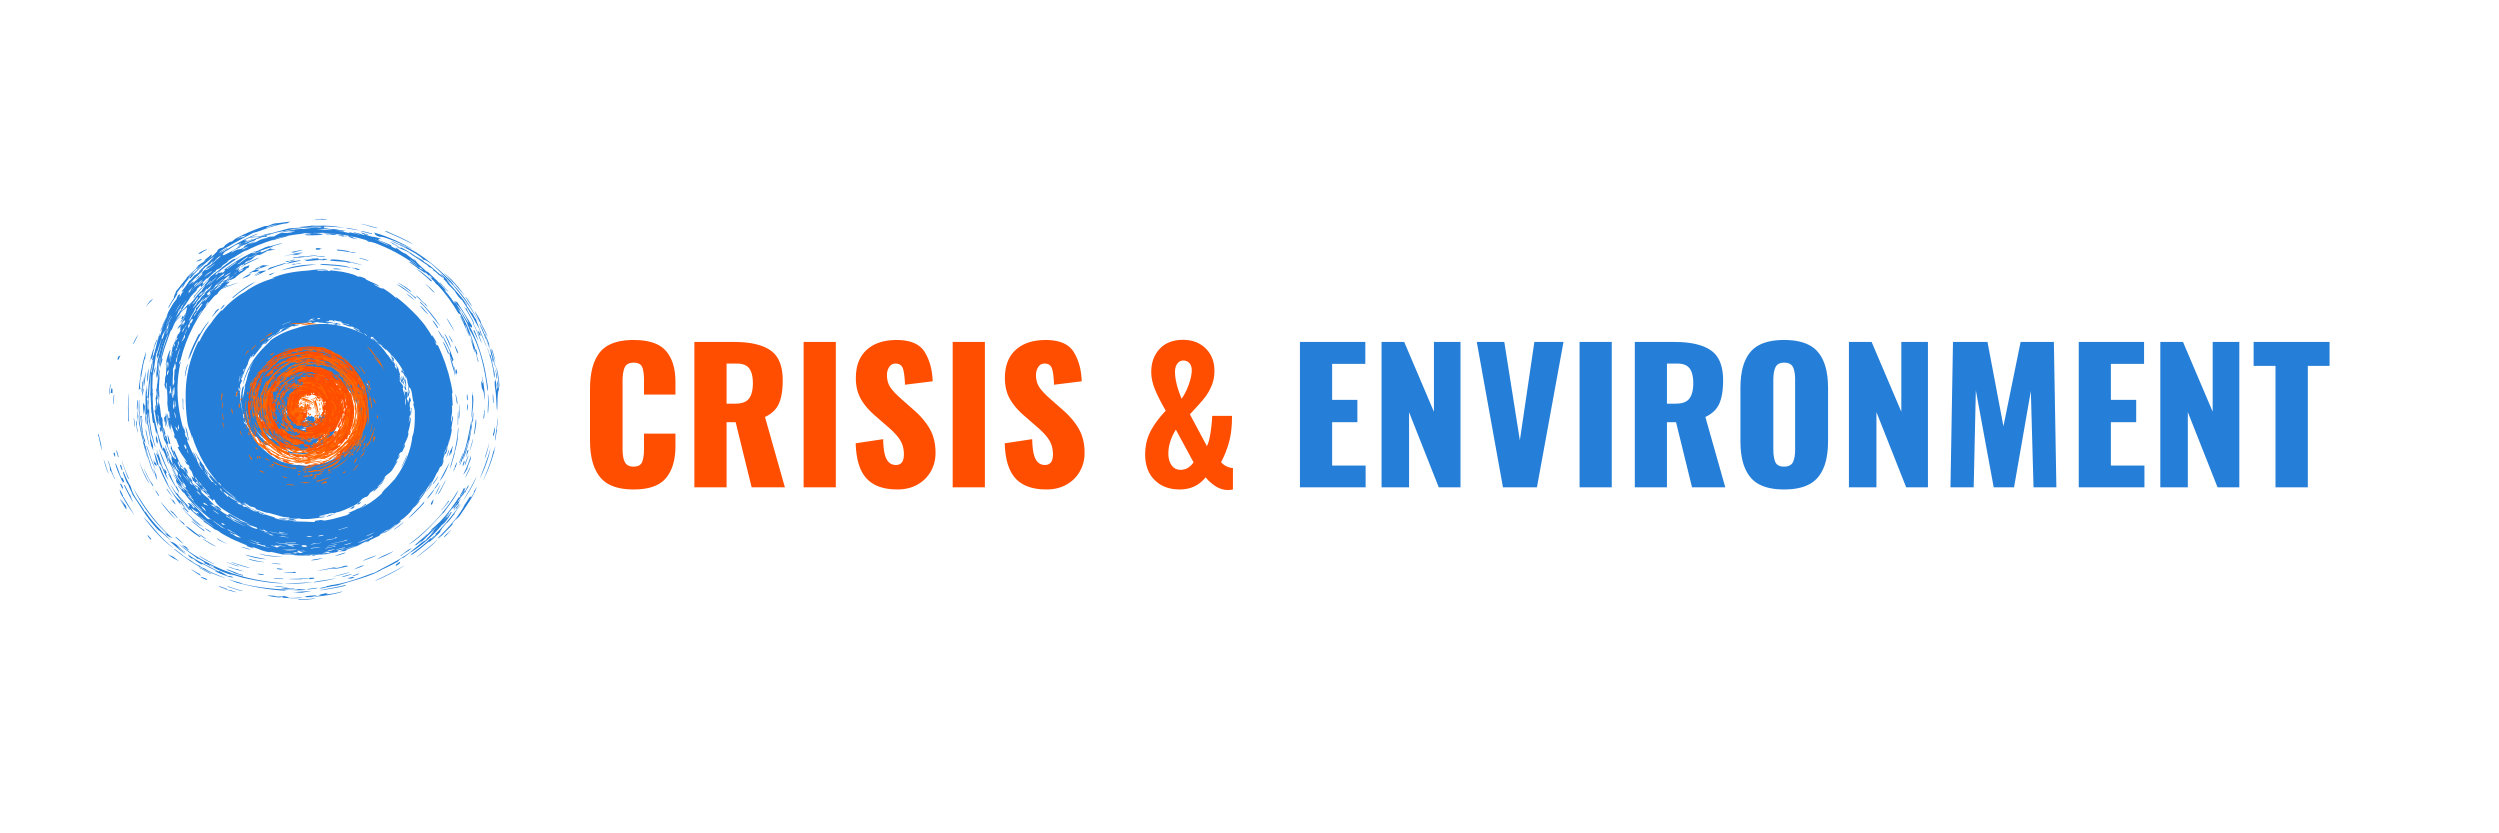 CRISIS & ENVIRONMENT